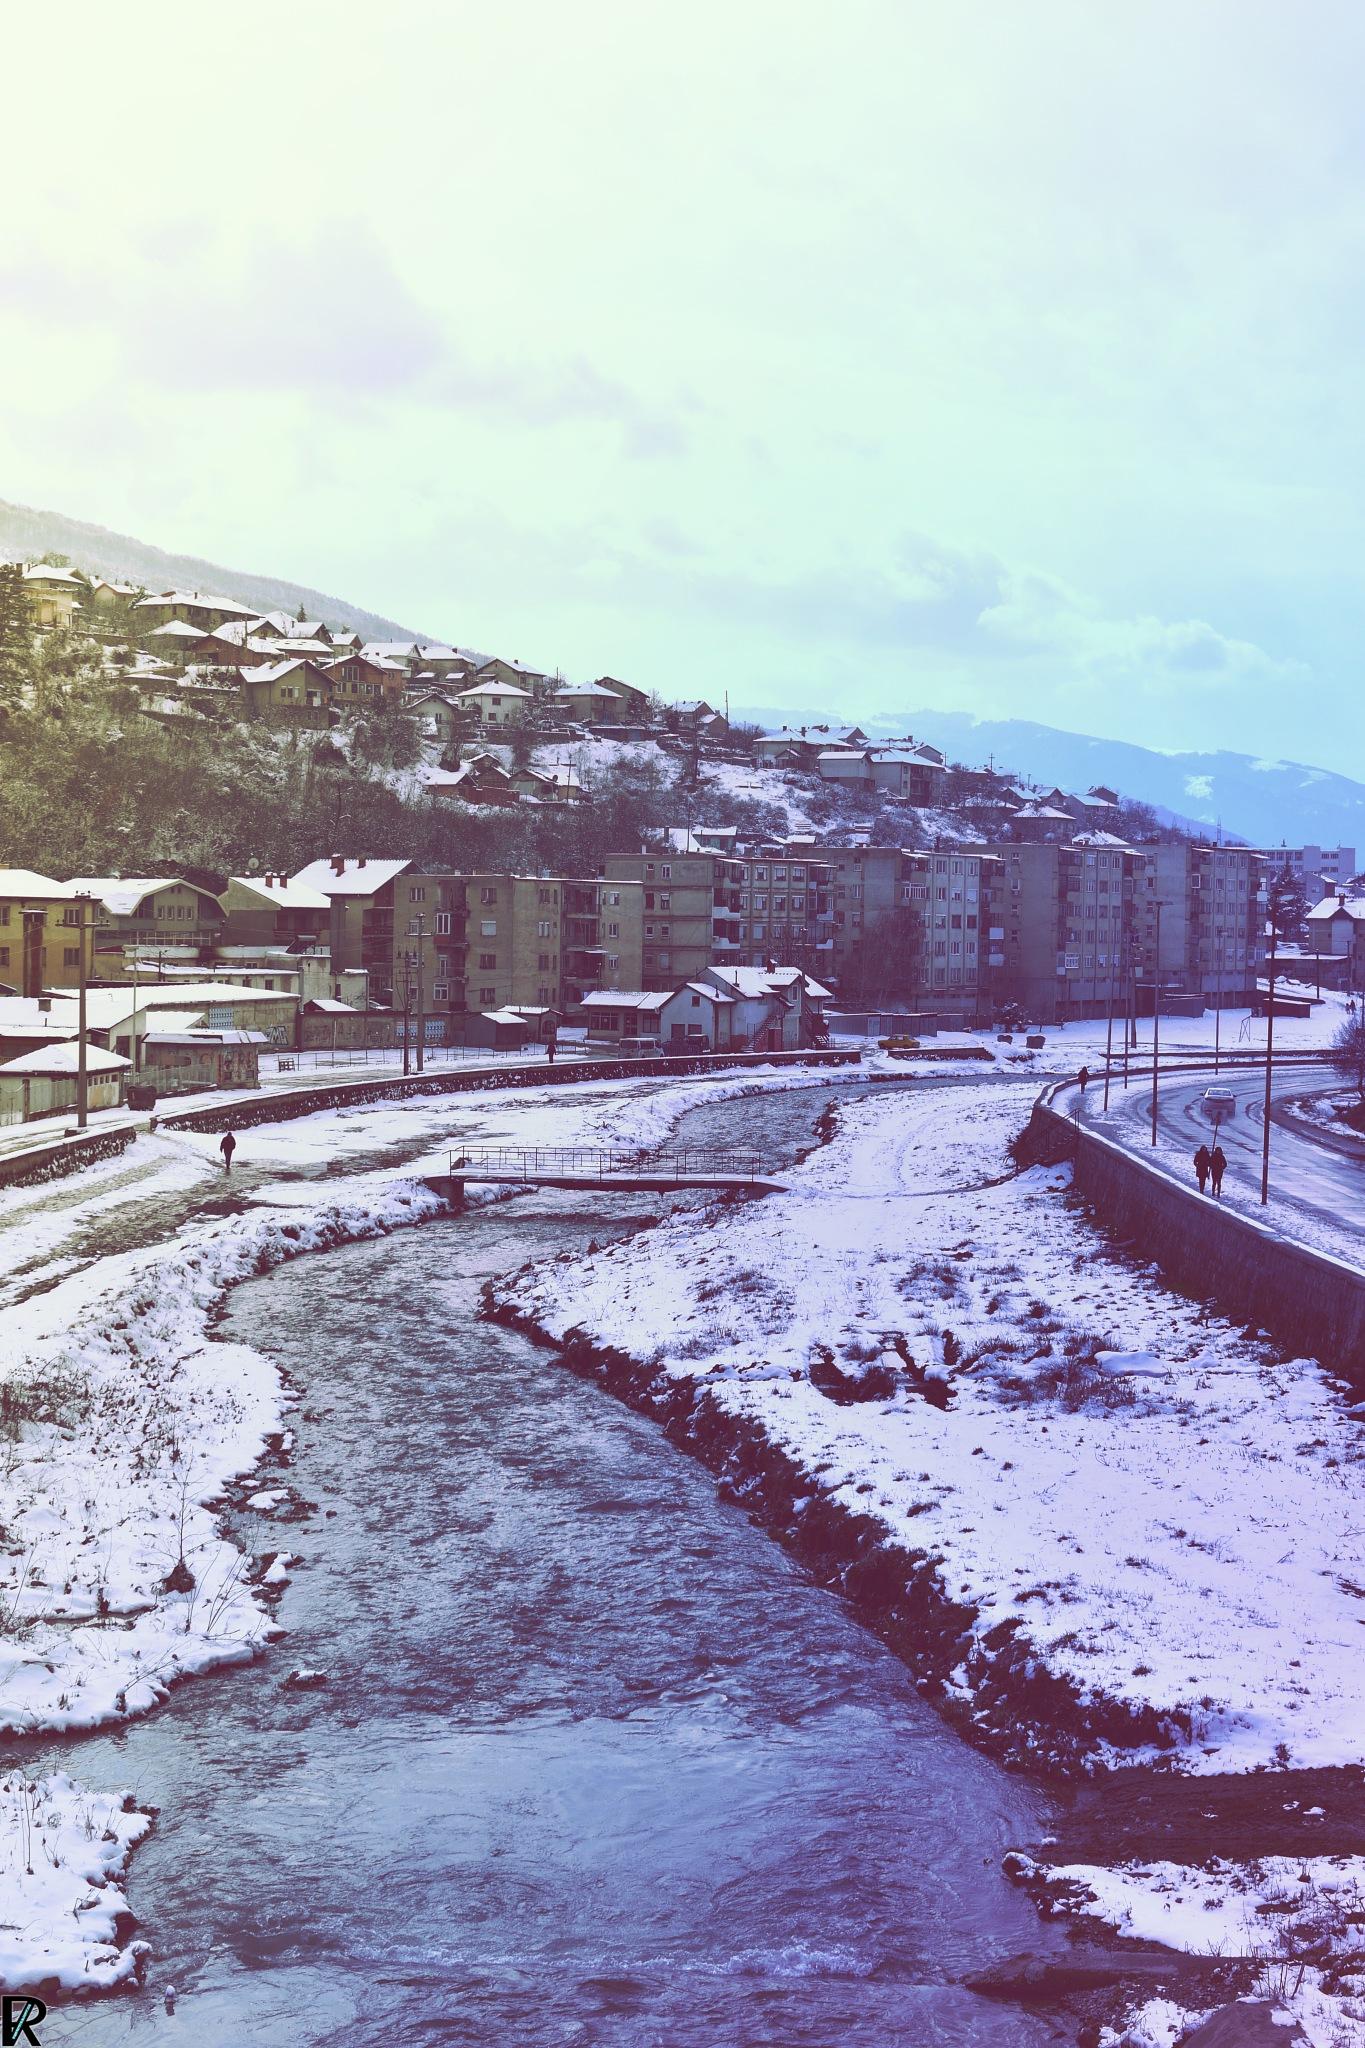 Winter in Kriva Palanka, Macedonia (14) by Robert Krstevski